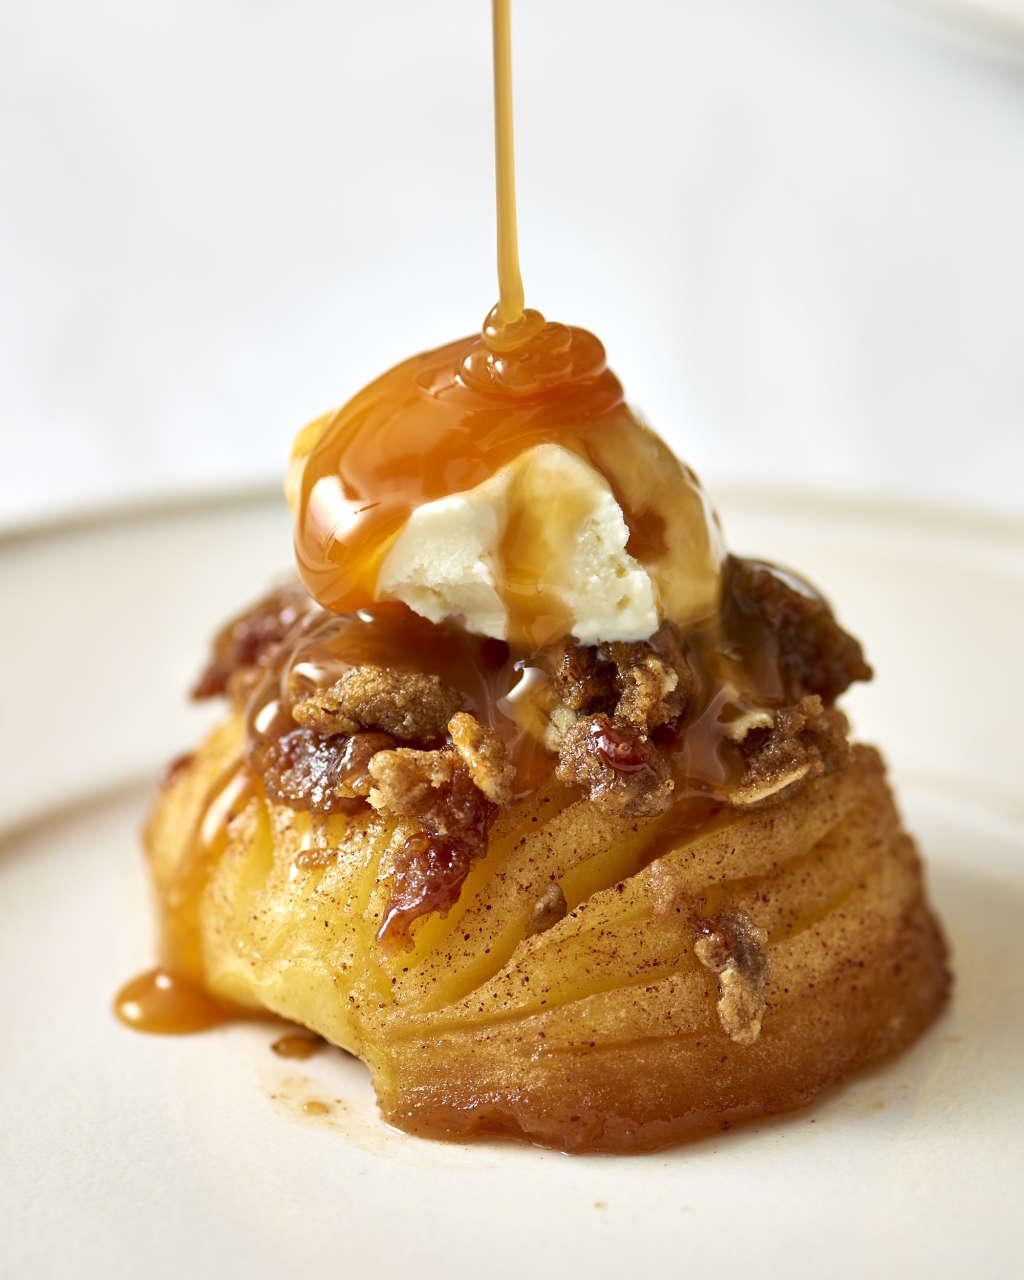 Hasselback Baked Apples Are Like Single-Serve Apple Crisps